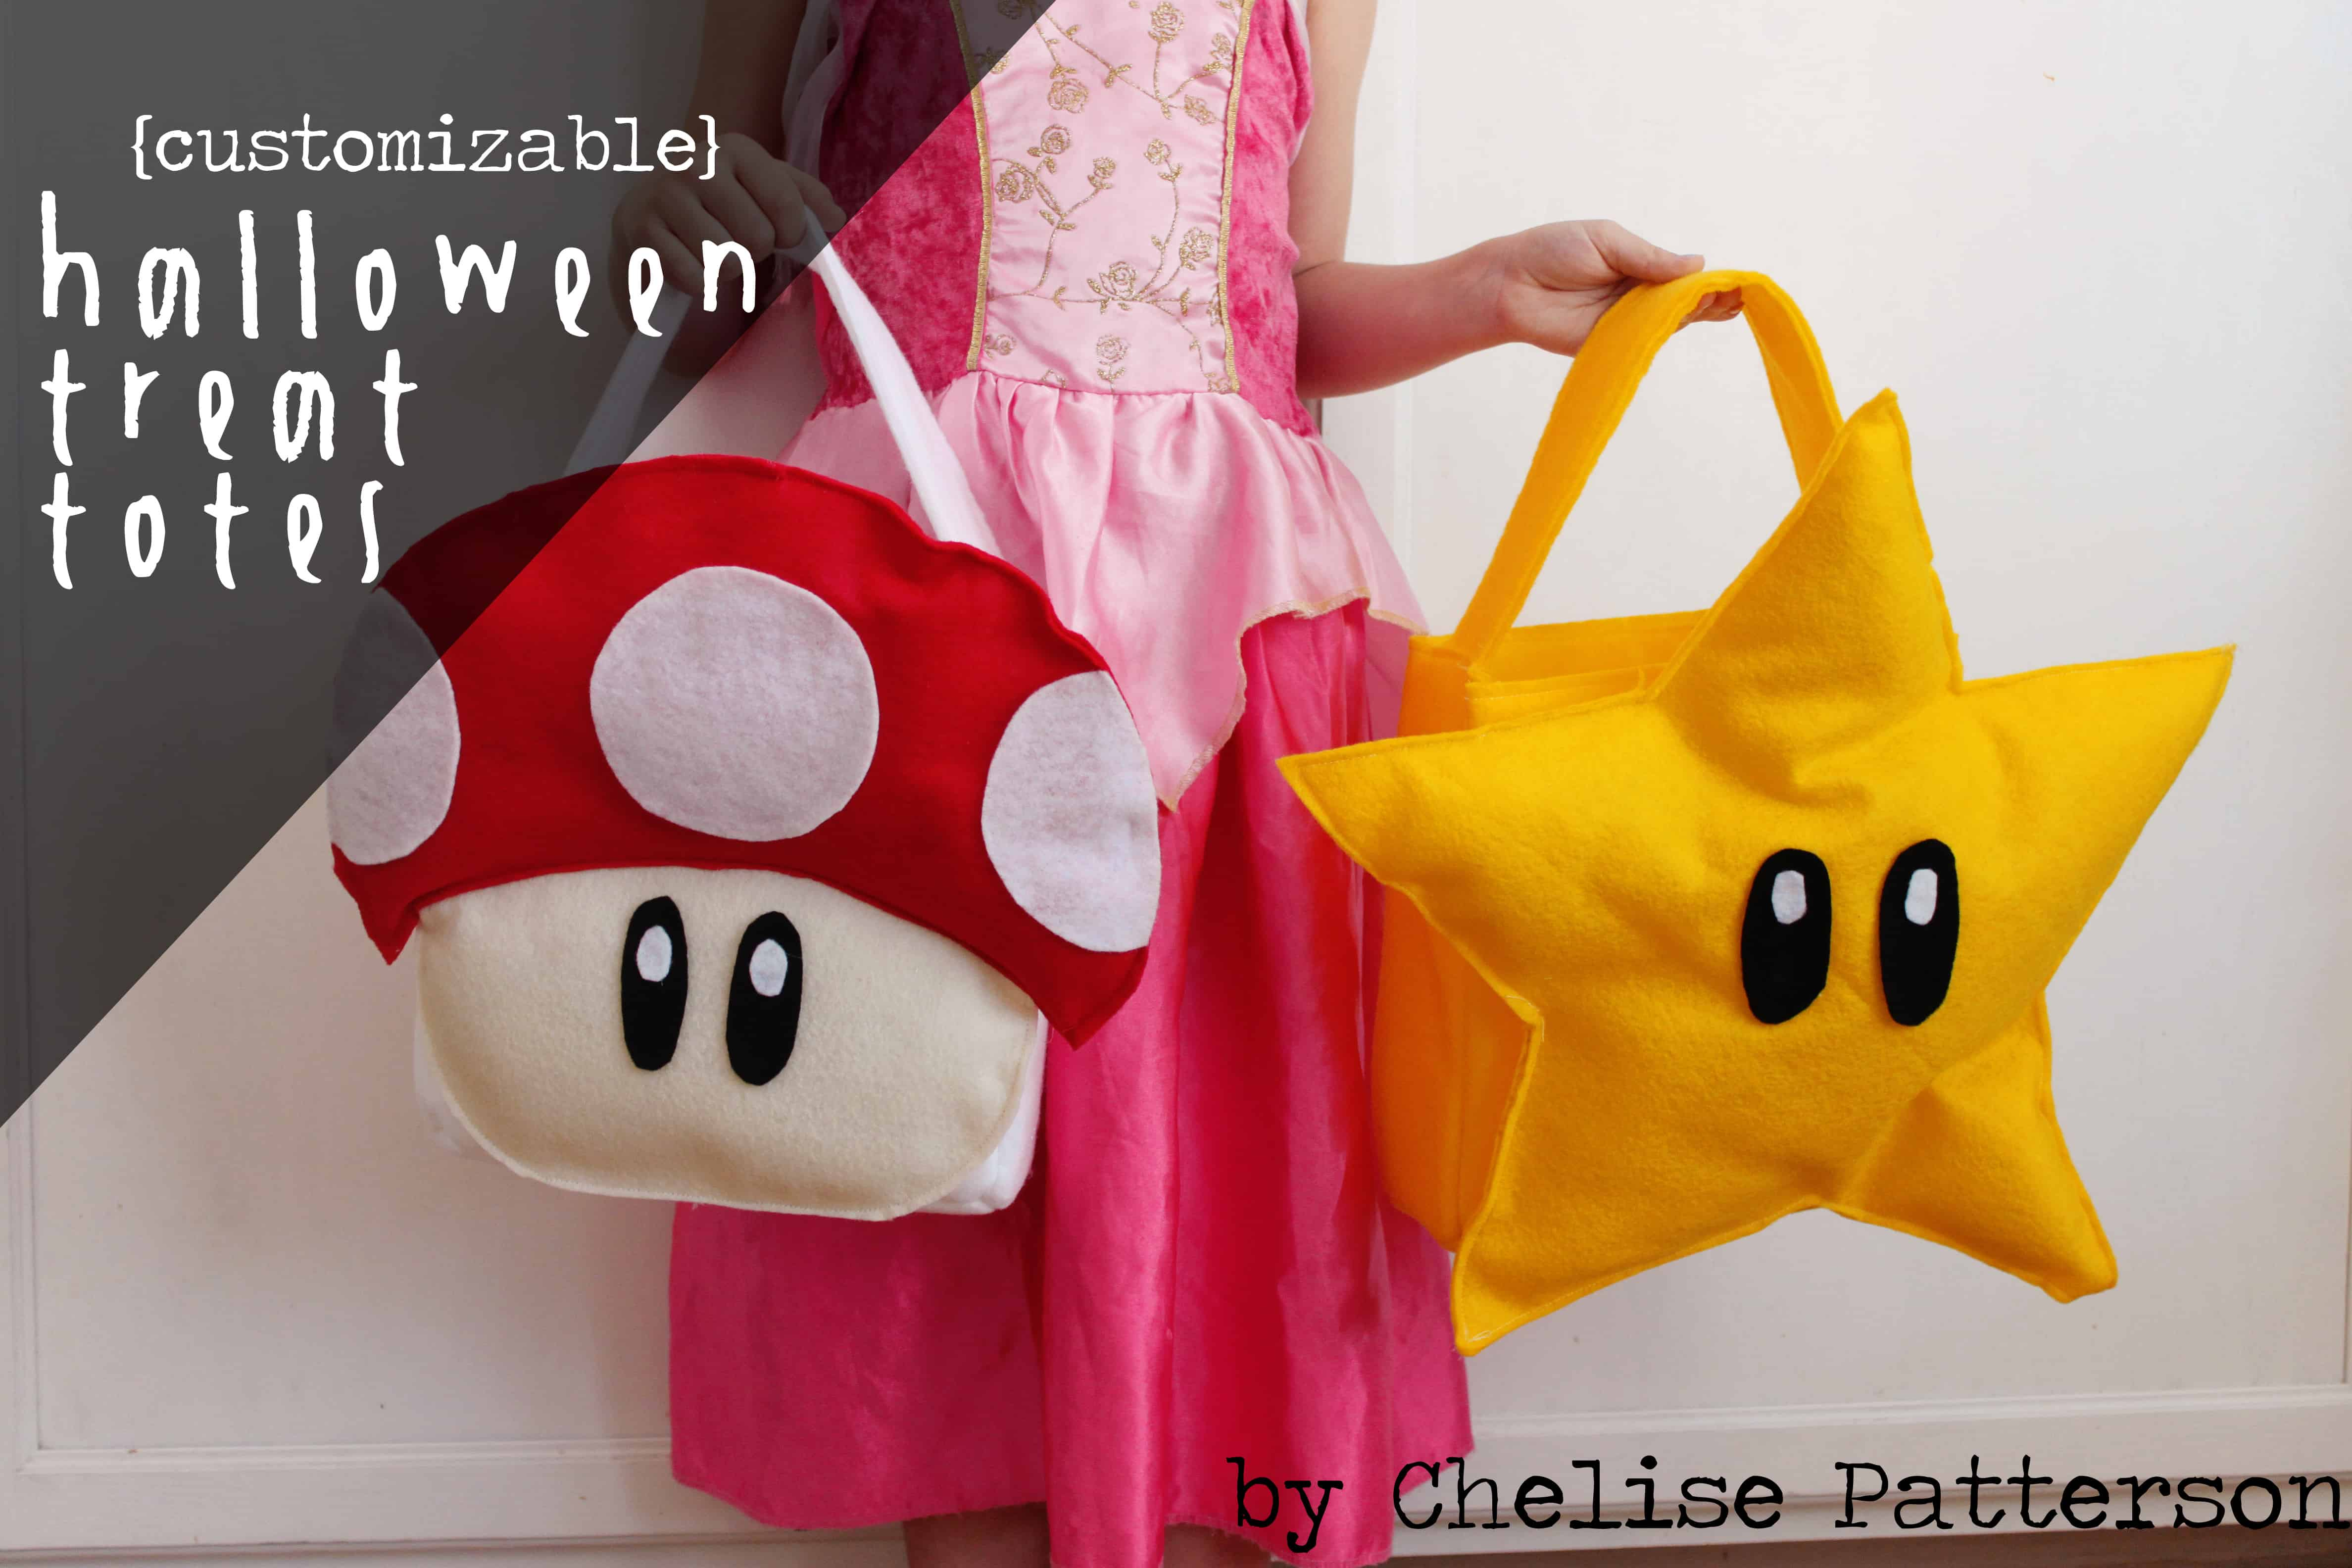 Custom Super Mario World themed treat bags